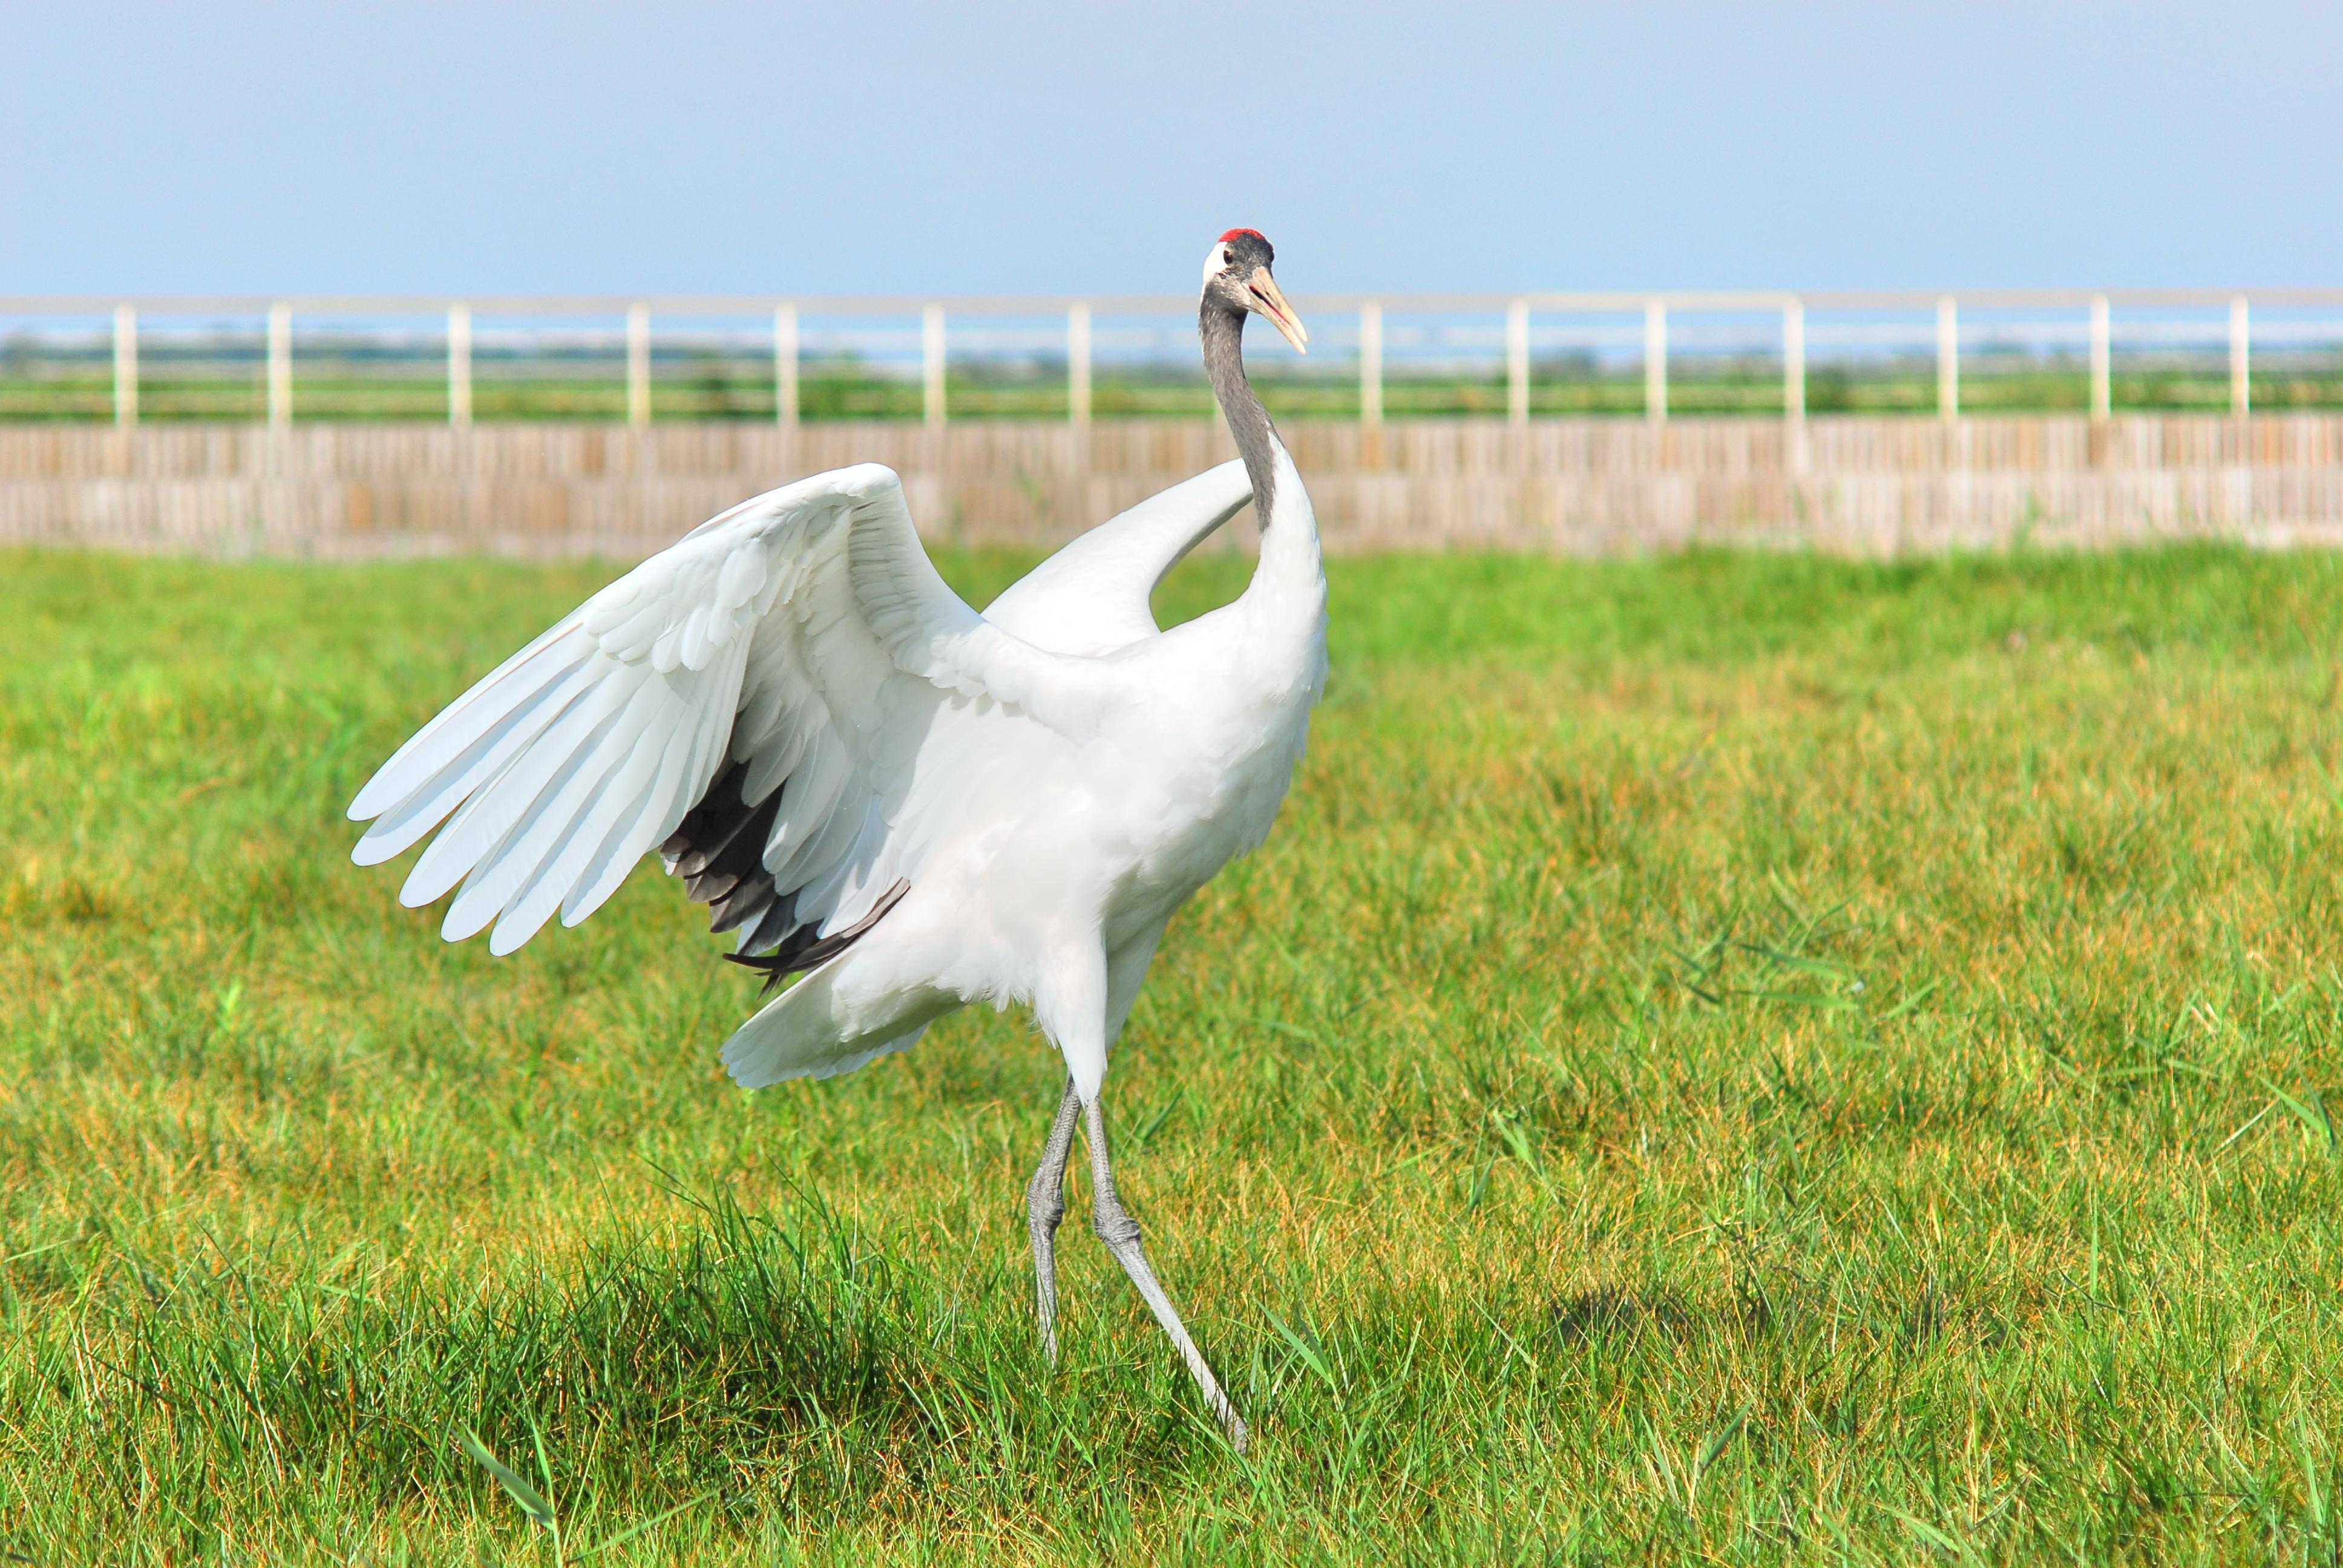 Yancheng Wetland National Nature Reserve Rare Birds